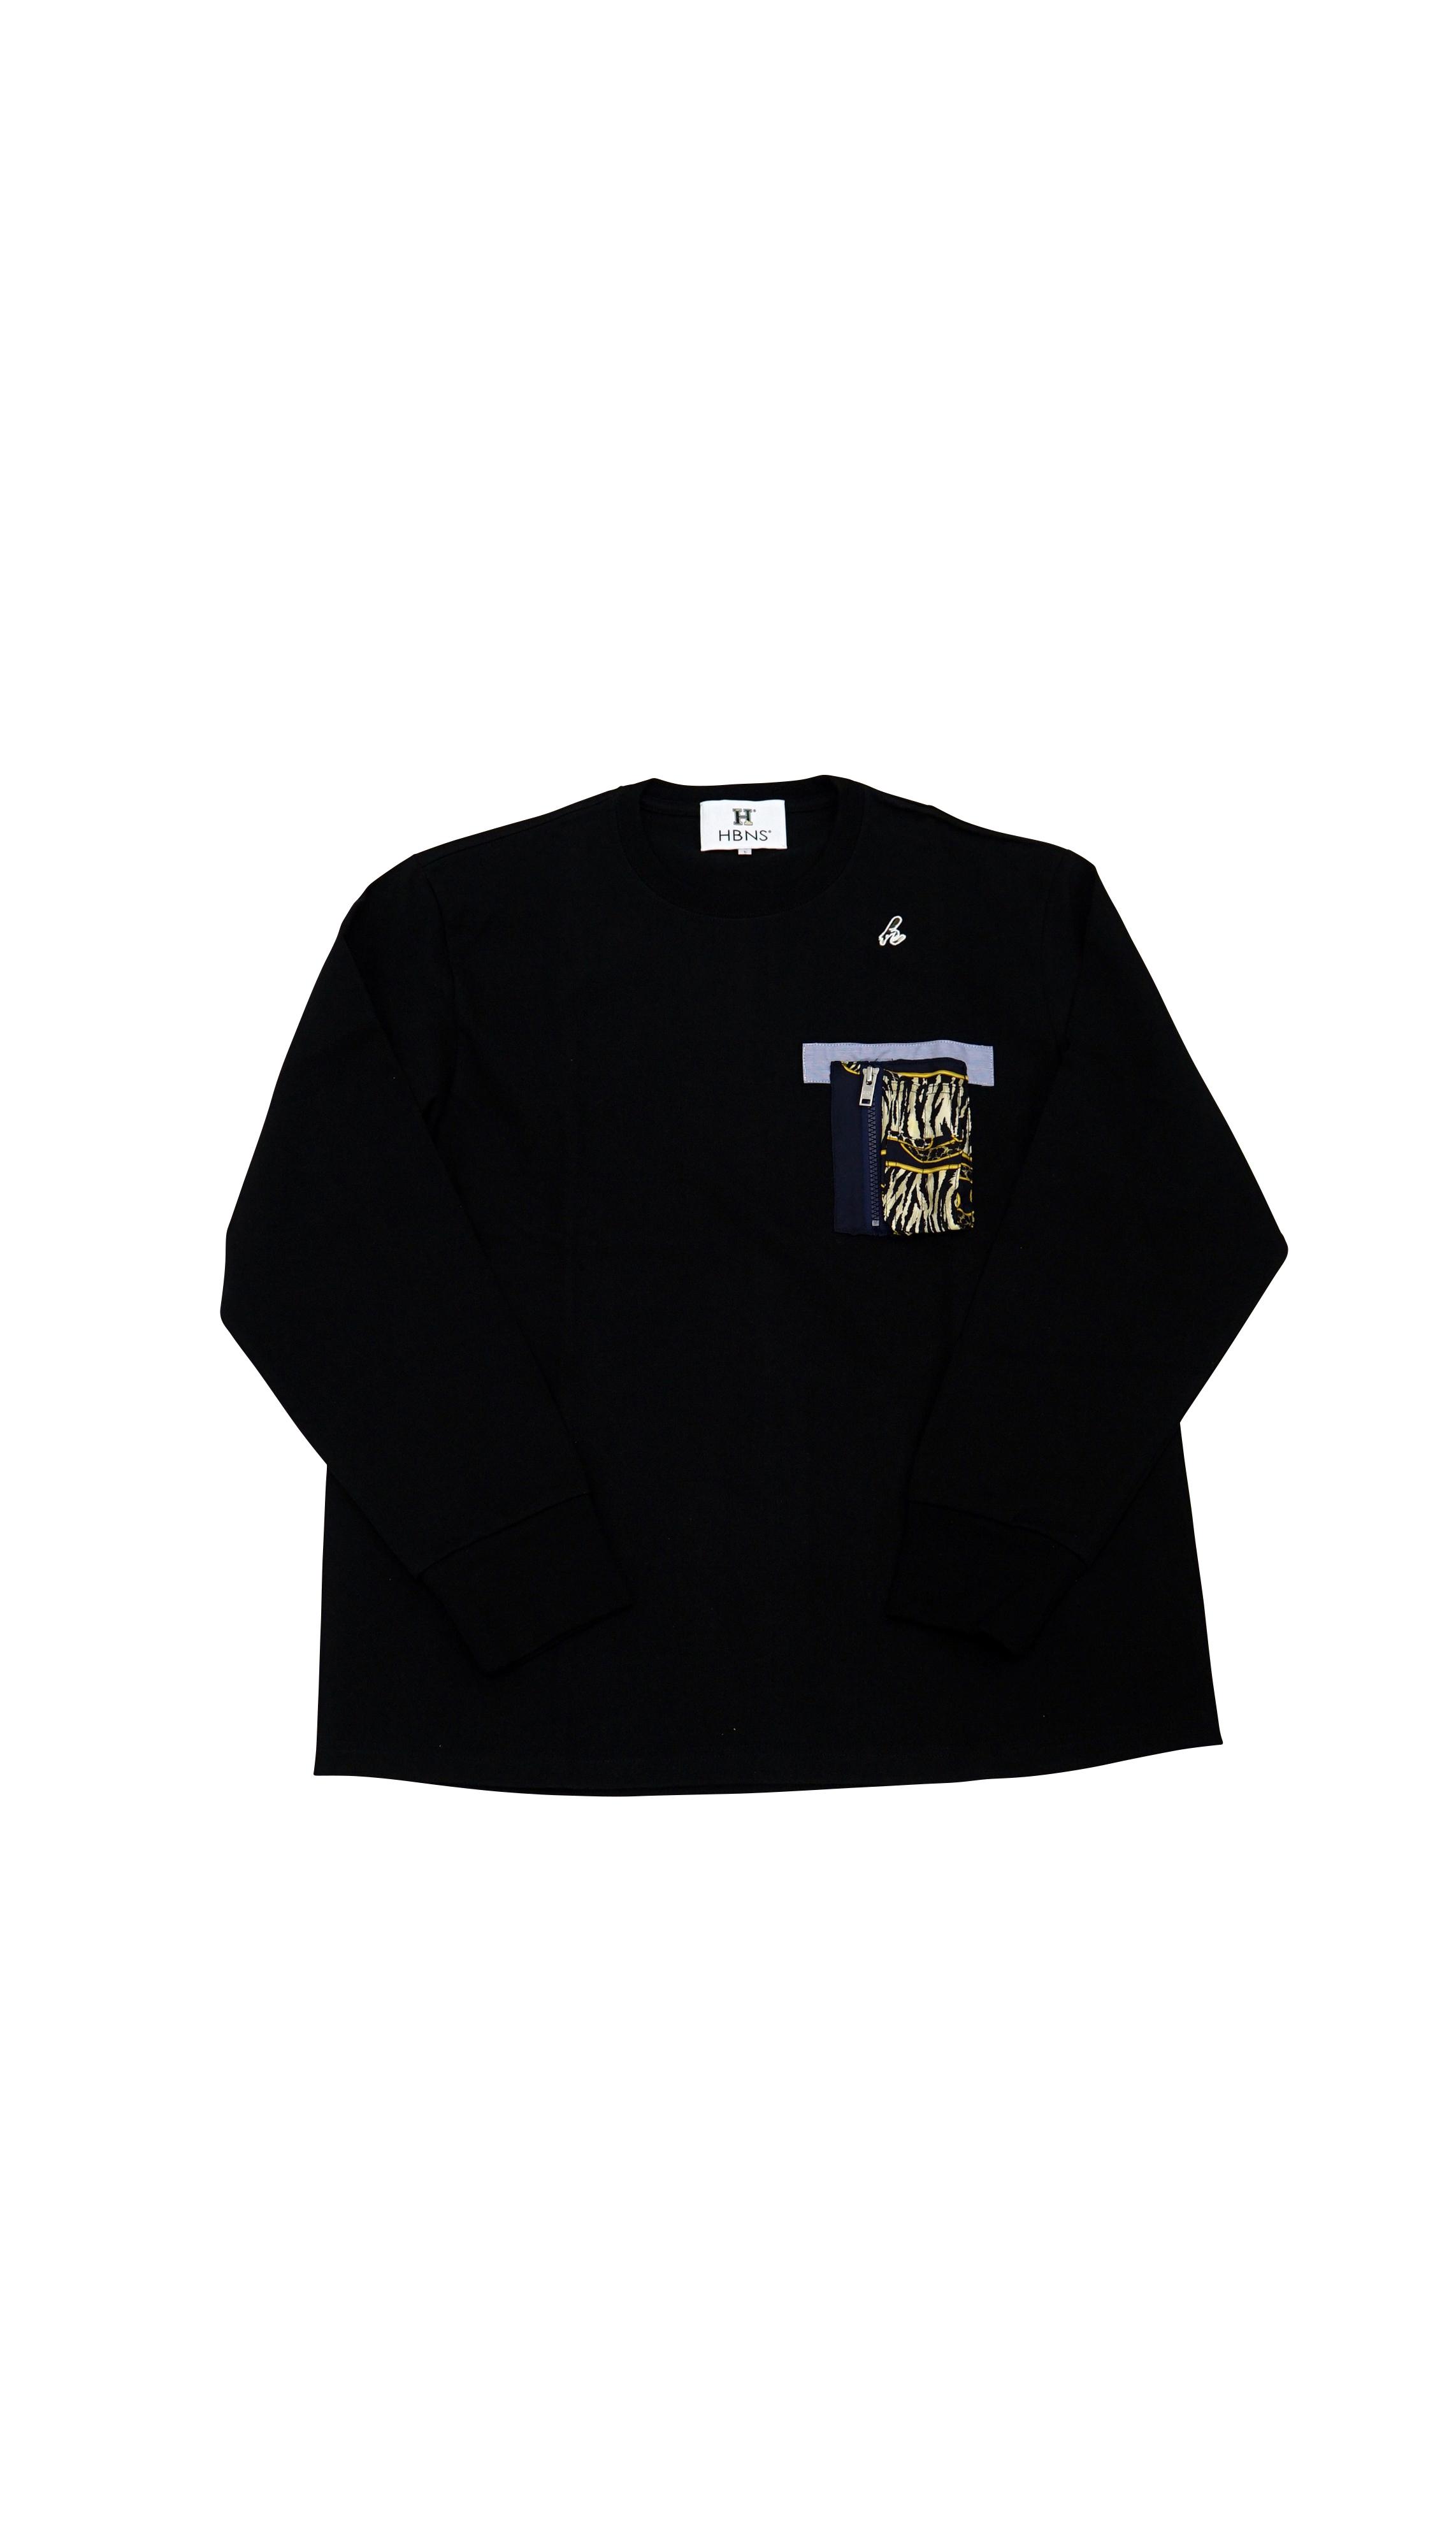 VINTAGE SCALF- POCKET L/SL Tee (BLACK  L)